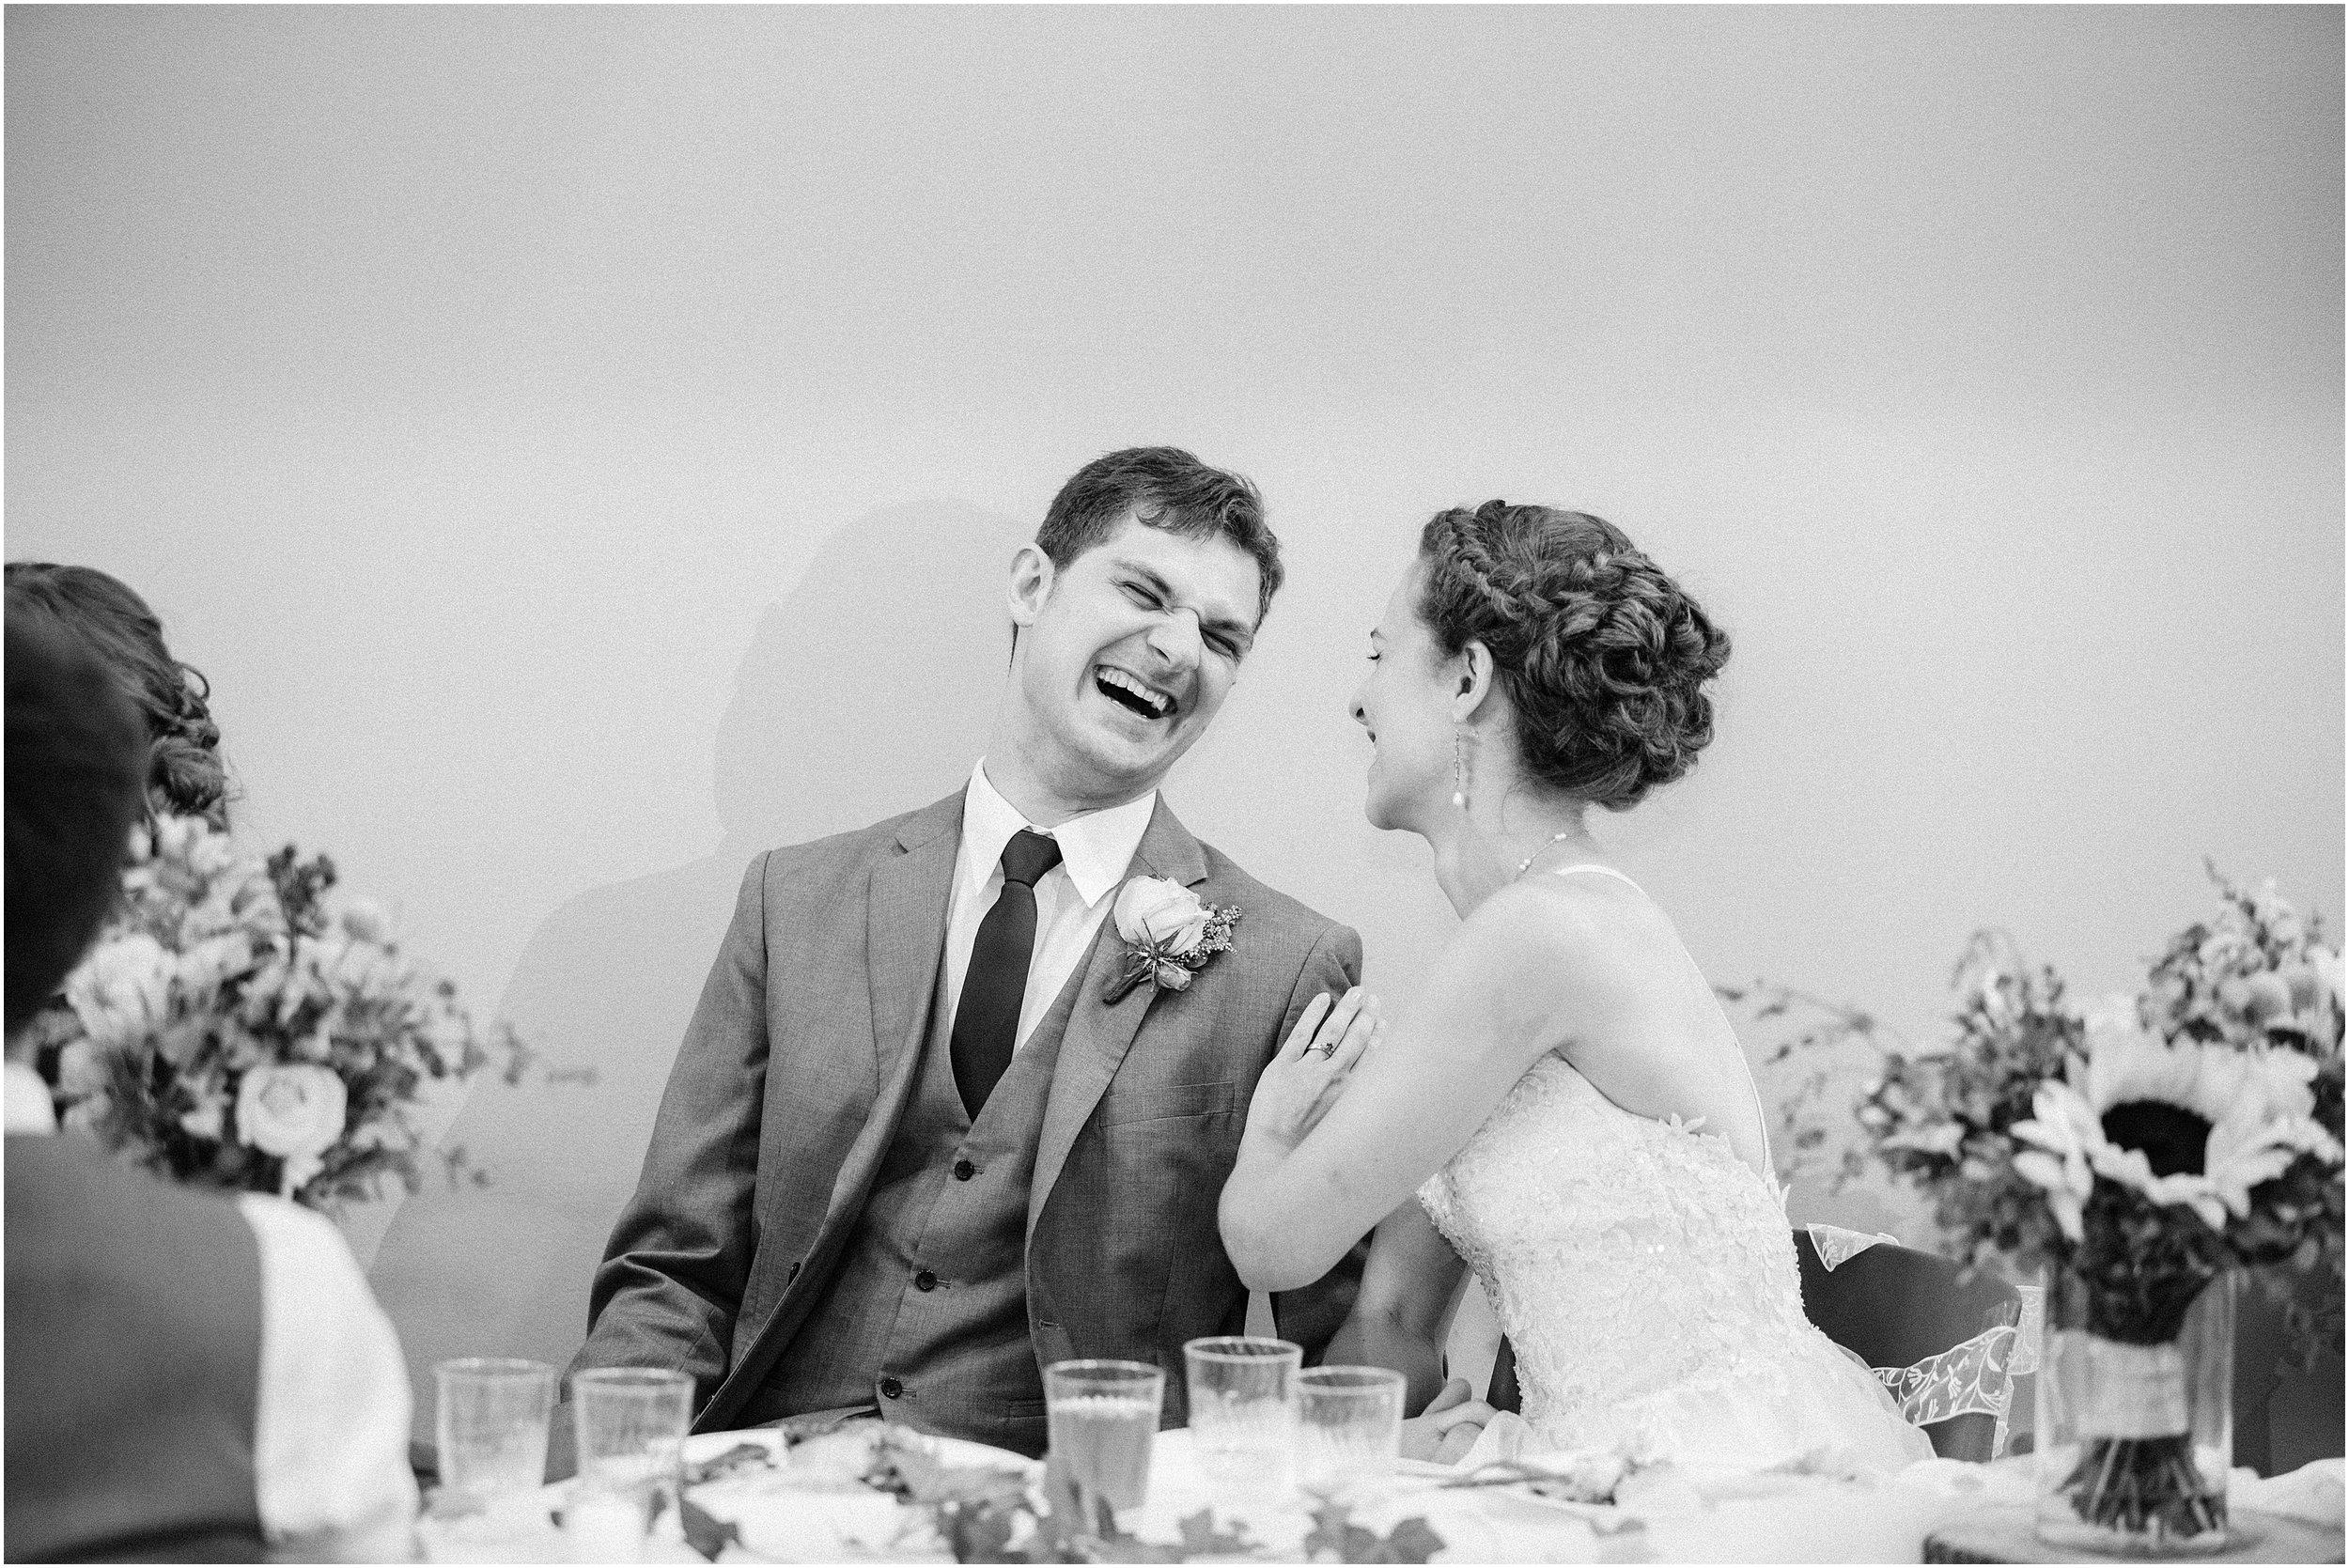 hannah leigh photography Cylburn Arboretum Wedding Baltimore, MD_3454.jpg